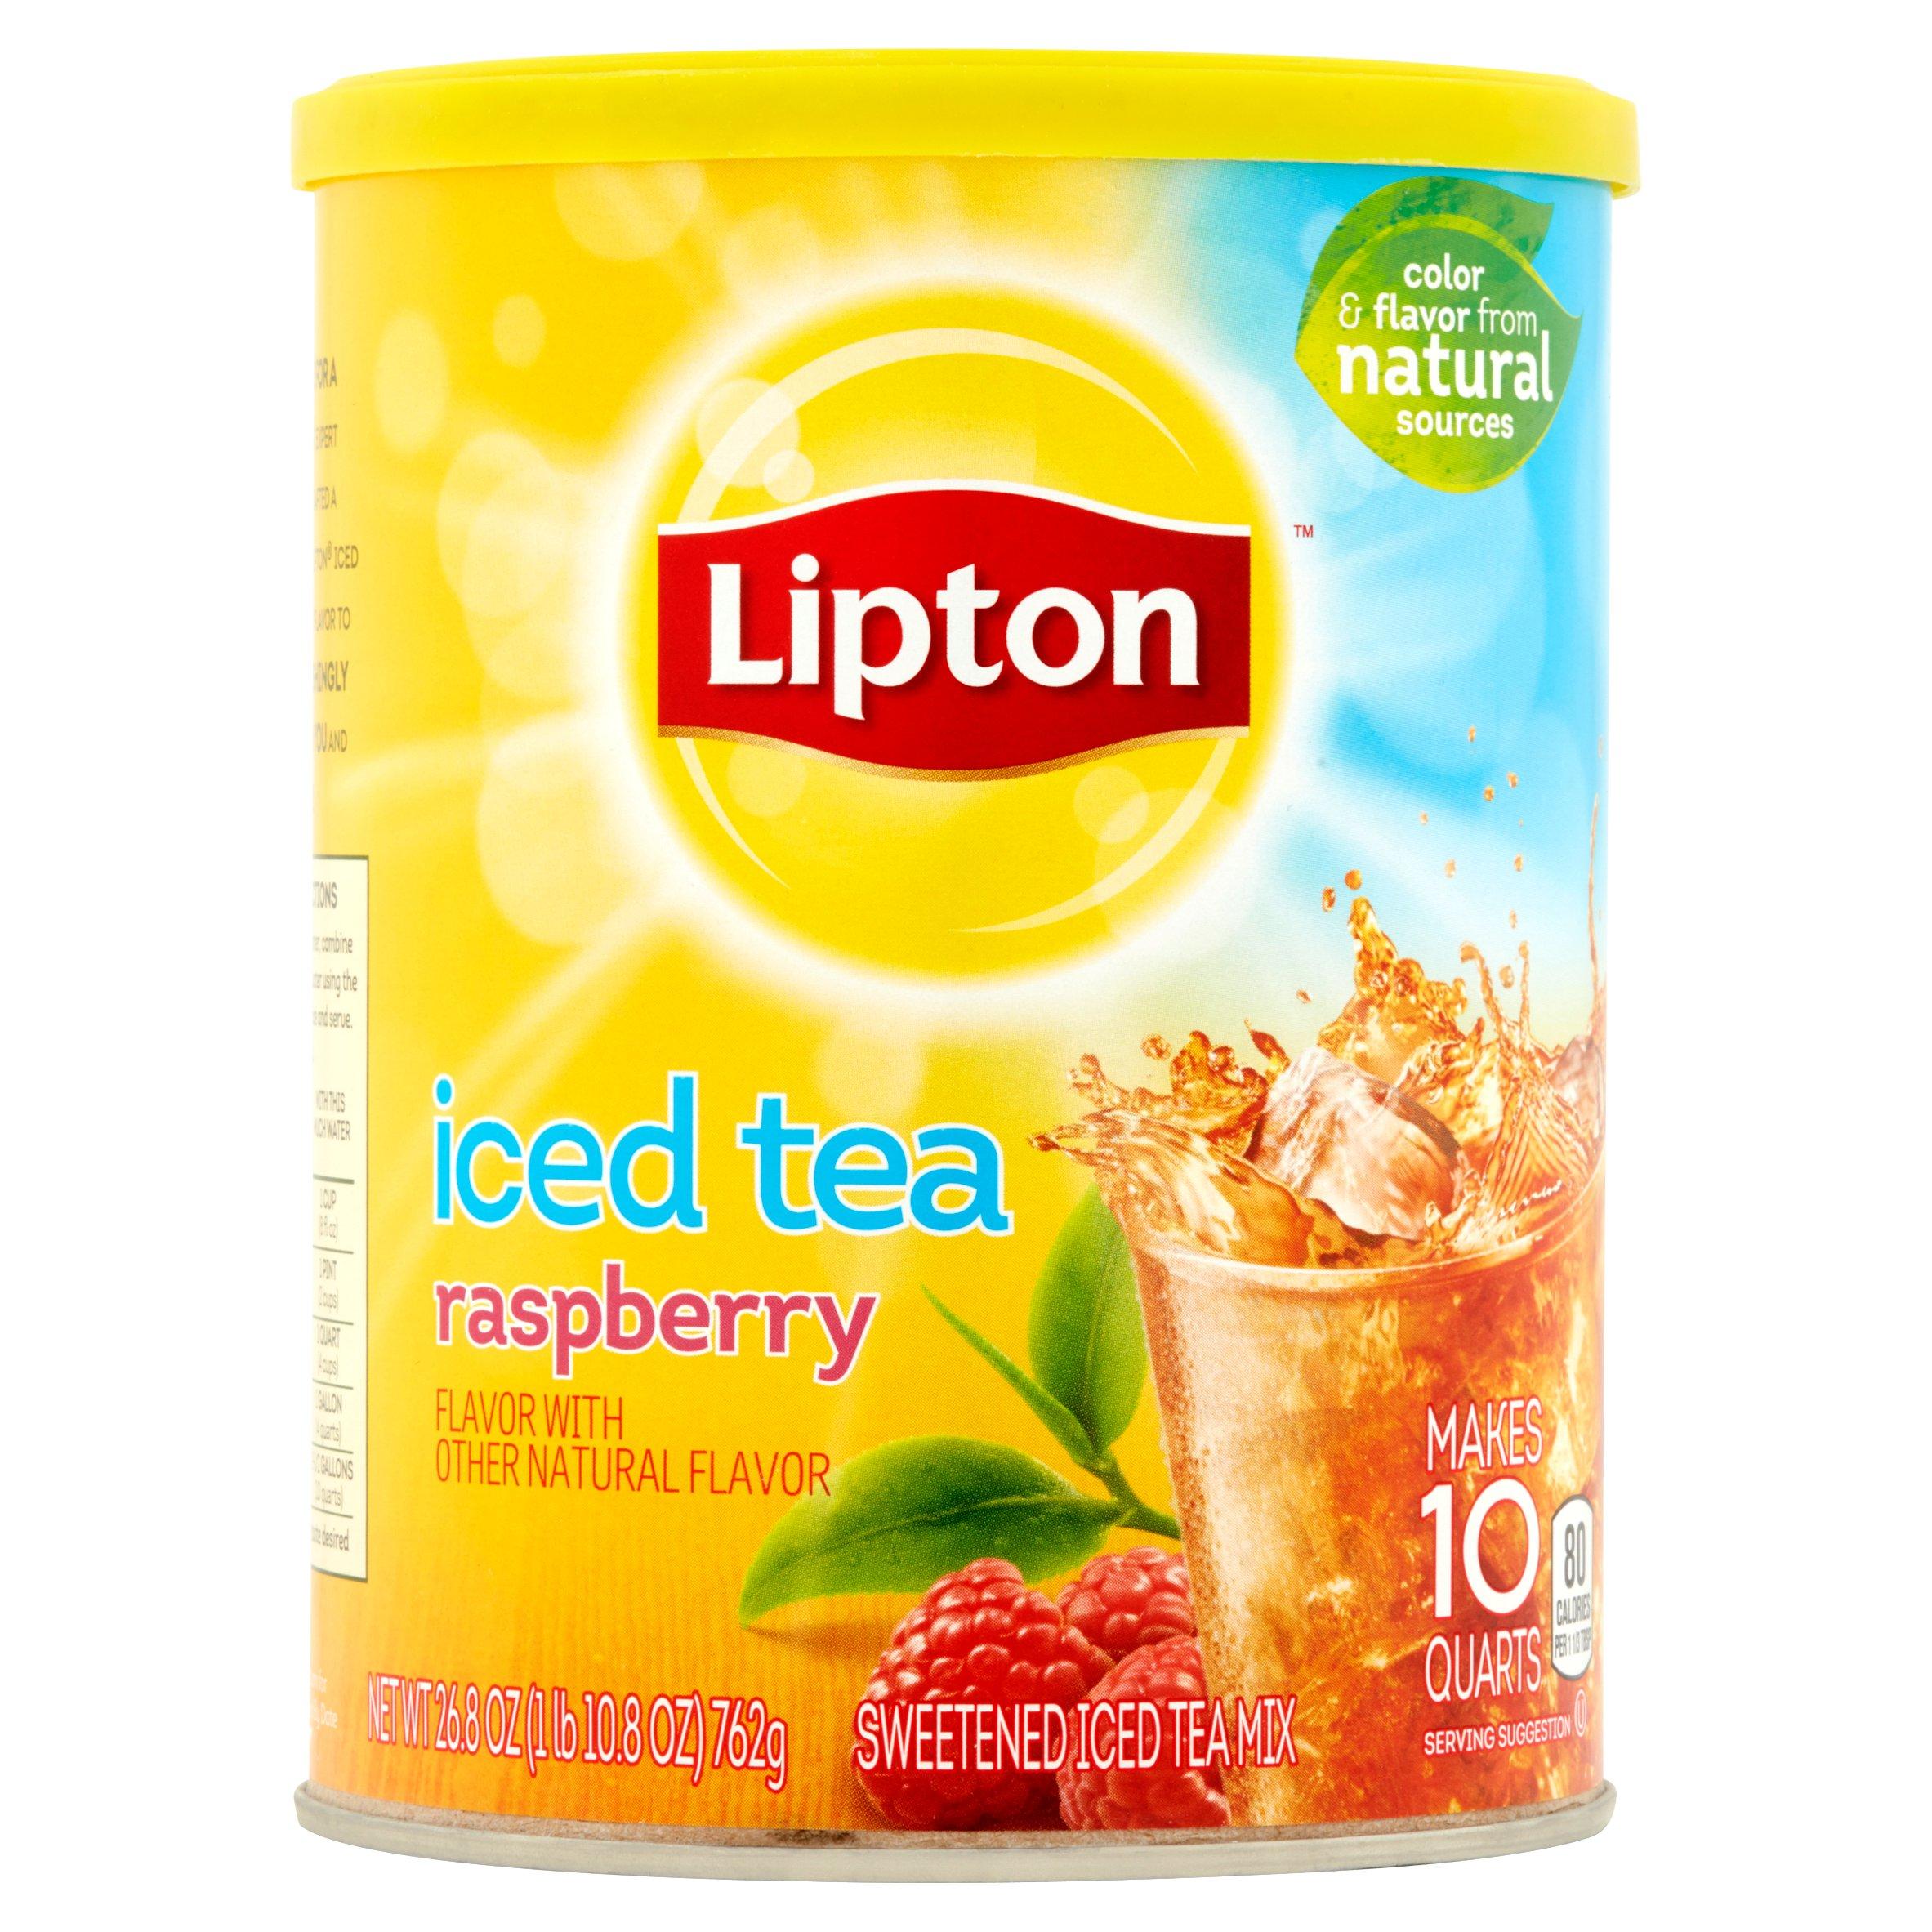 Lipton Wild Raspberry Sugar Sweetened Iced Tea Mix, 28.3 Oz